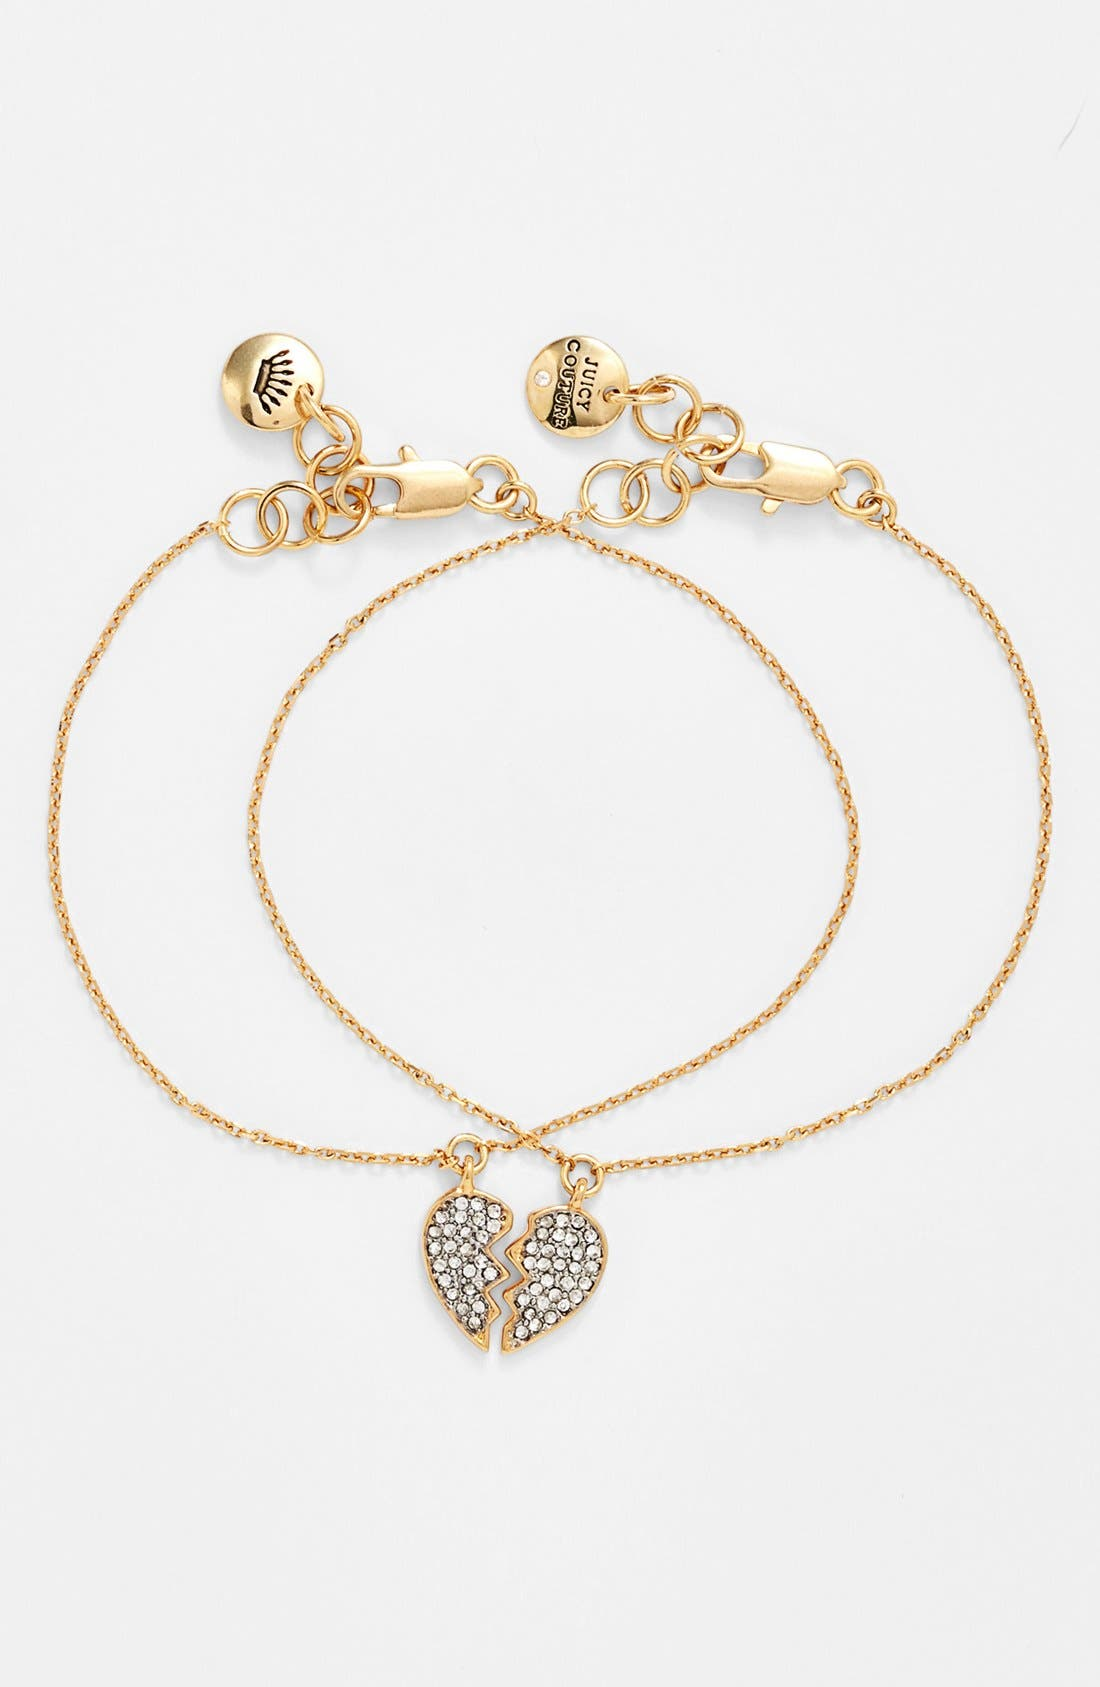 Alternate Image 1 Selected - Juicy Couture 'Signatures' Friendship Charm Bracelets (Set of 2)